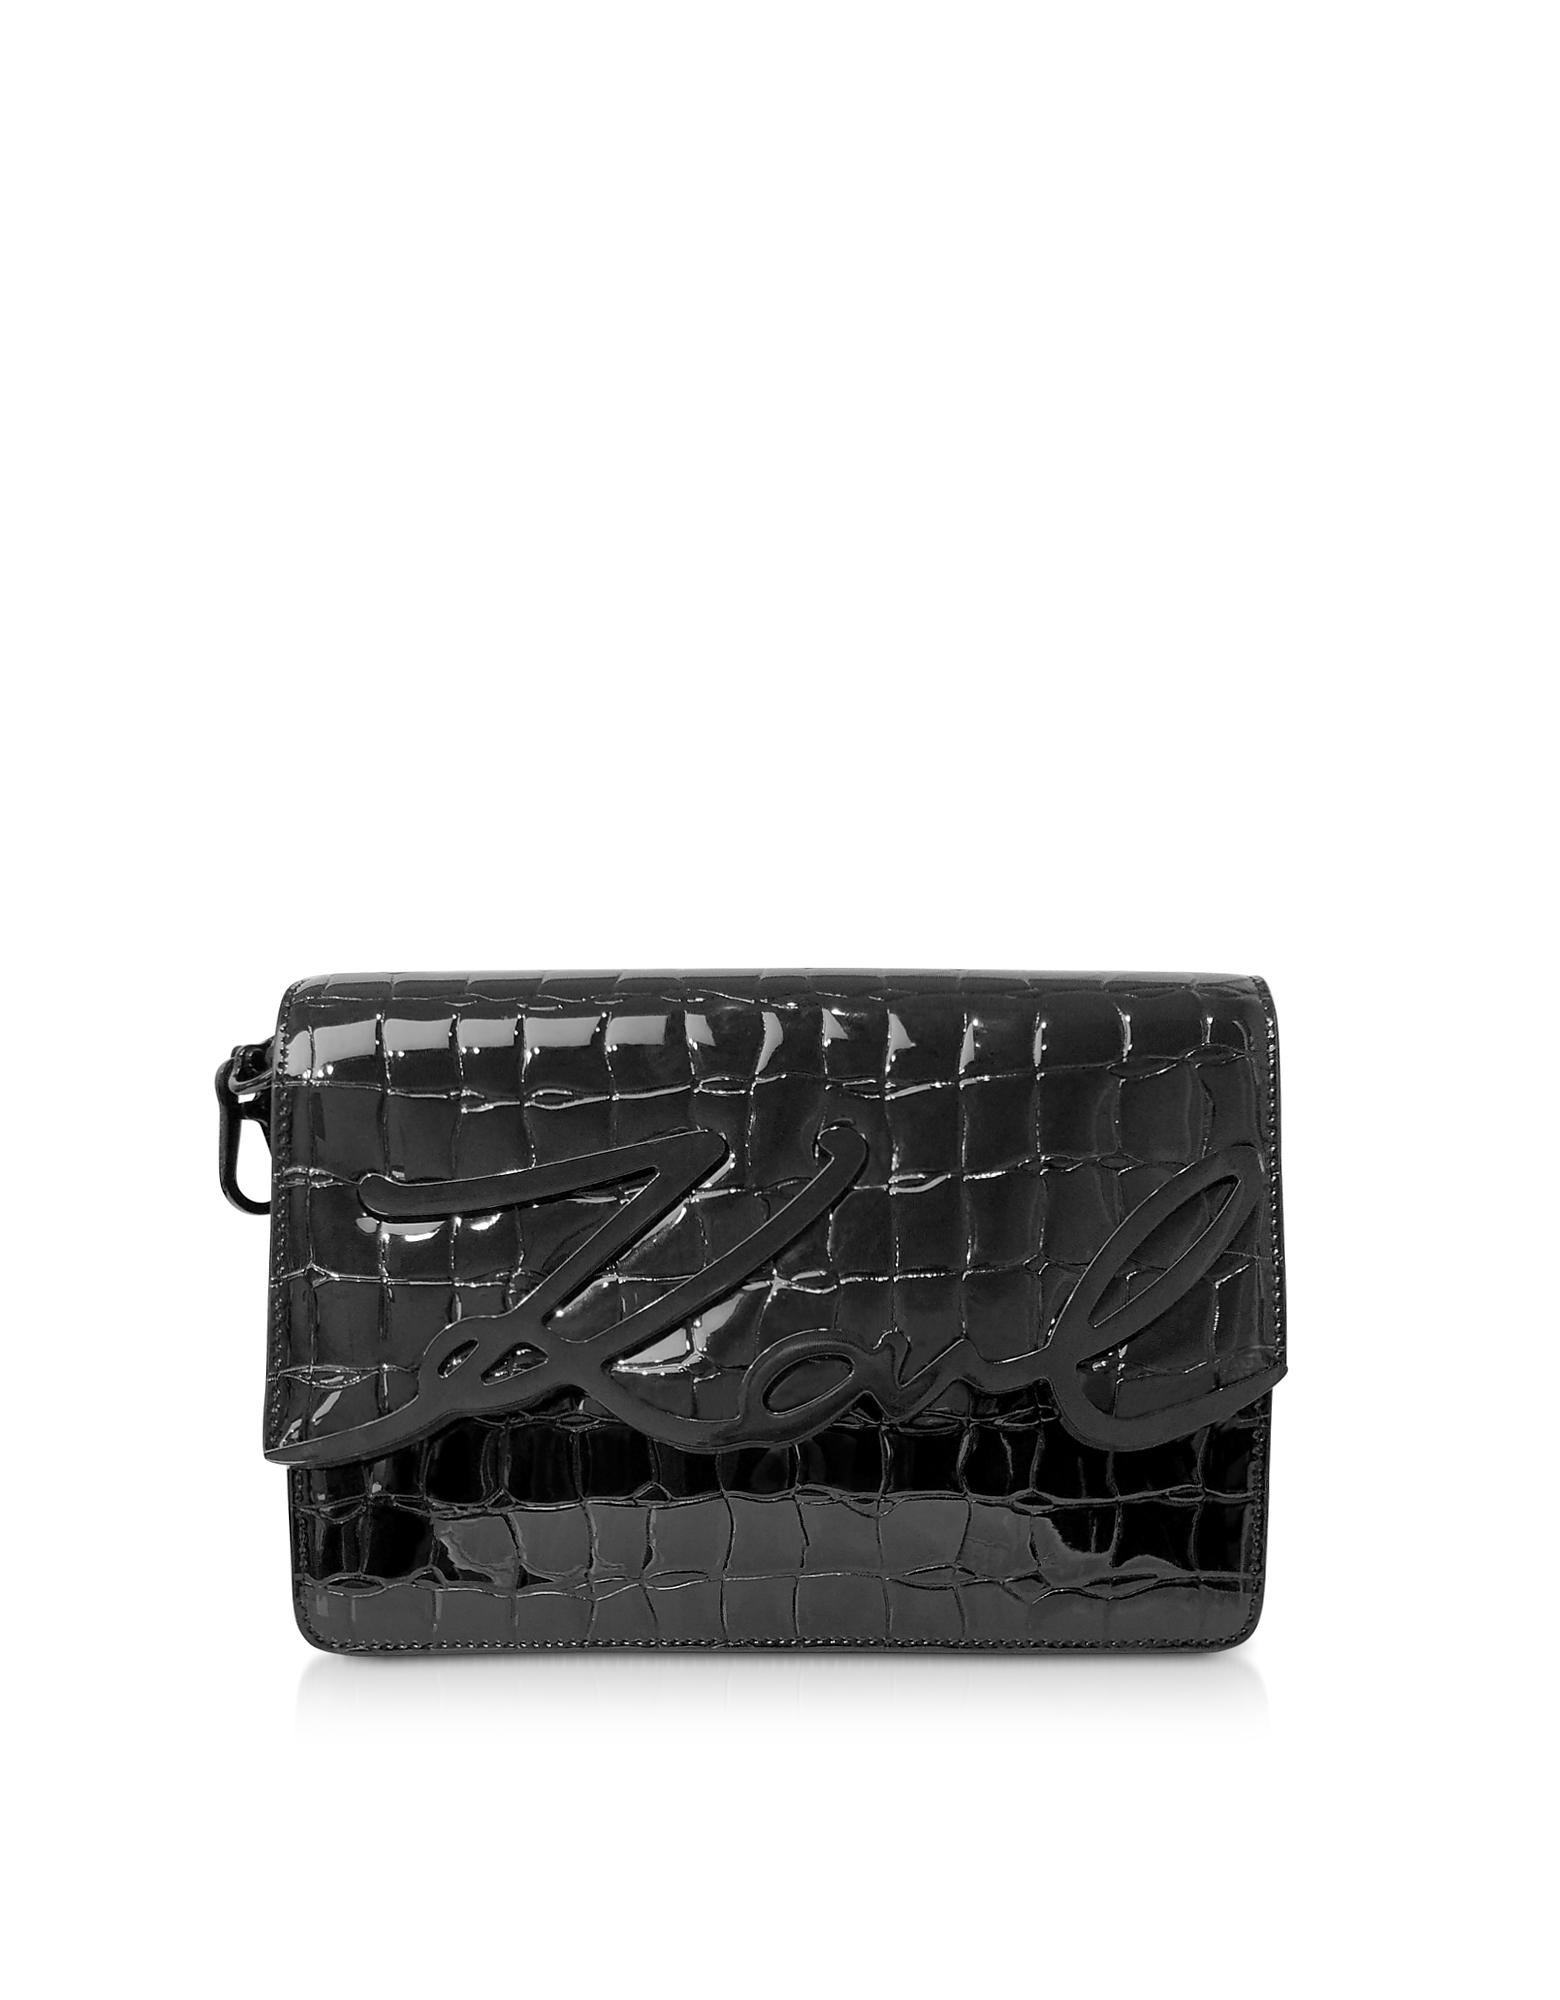 K/Signature Black Croco Leather Shoulder Bag w/ Signature